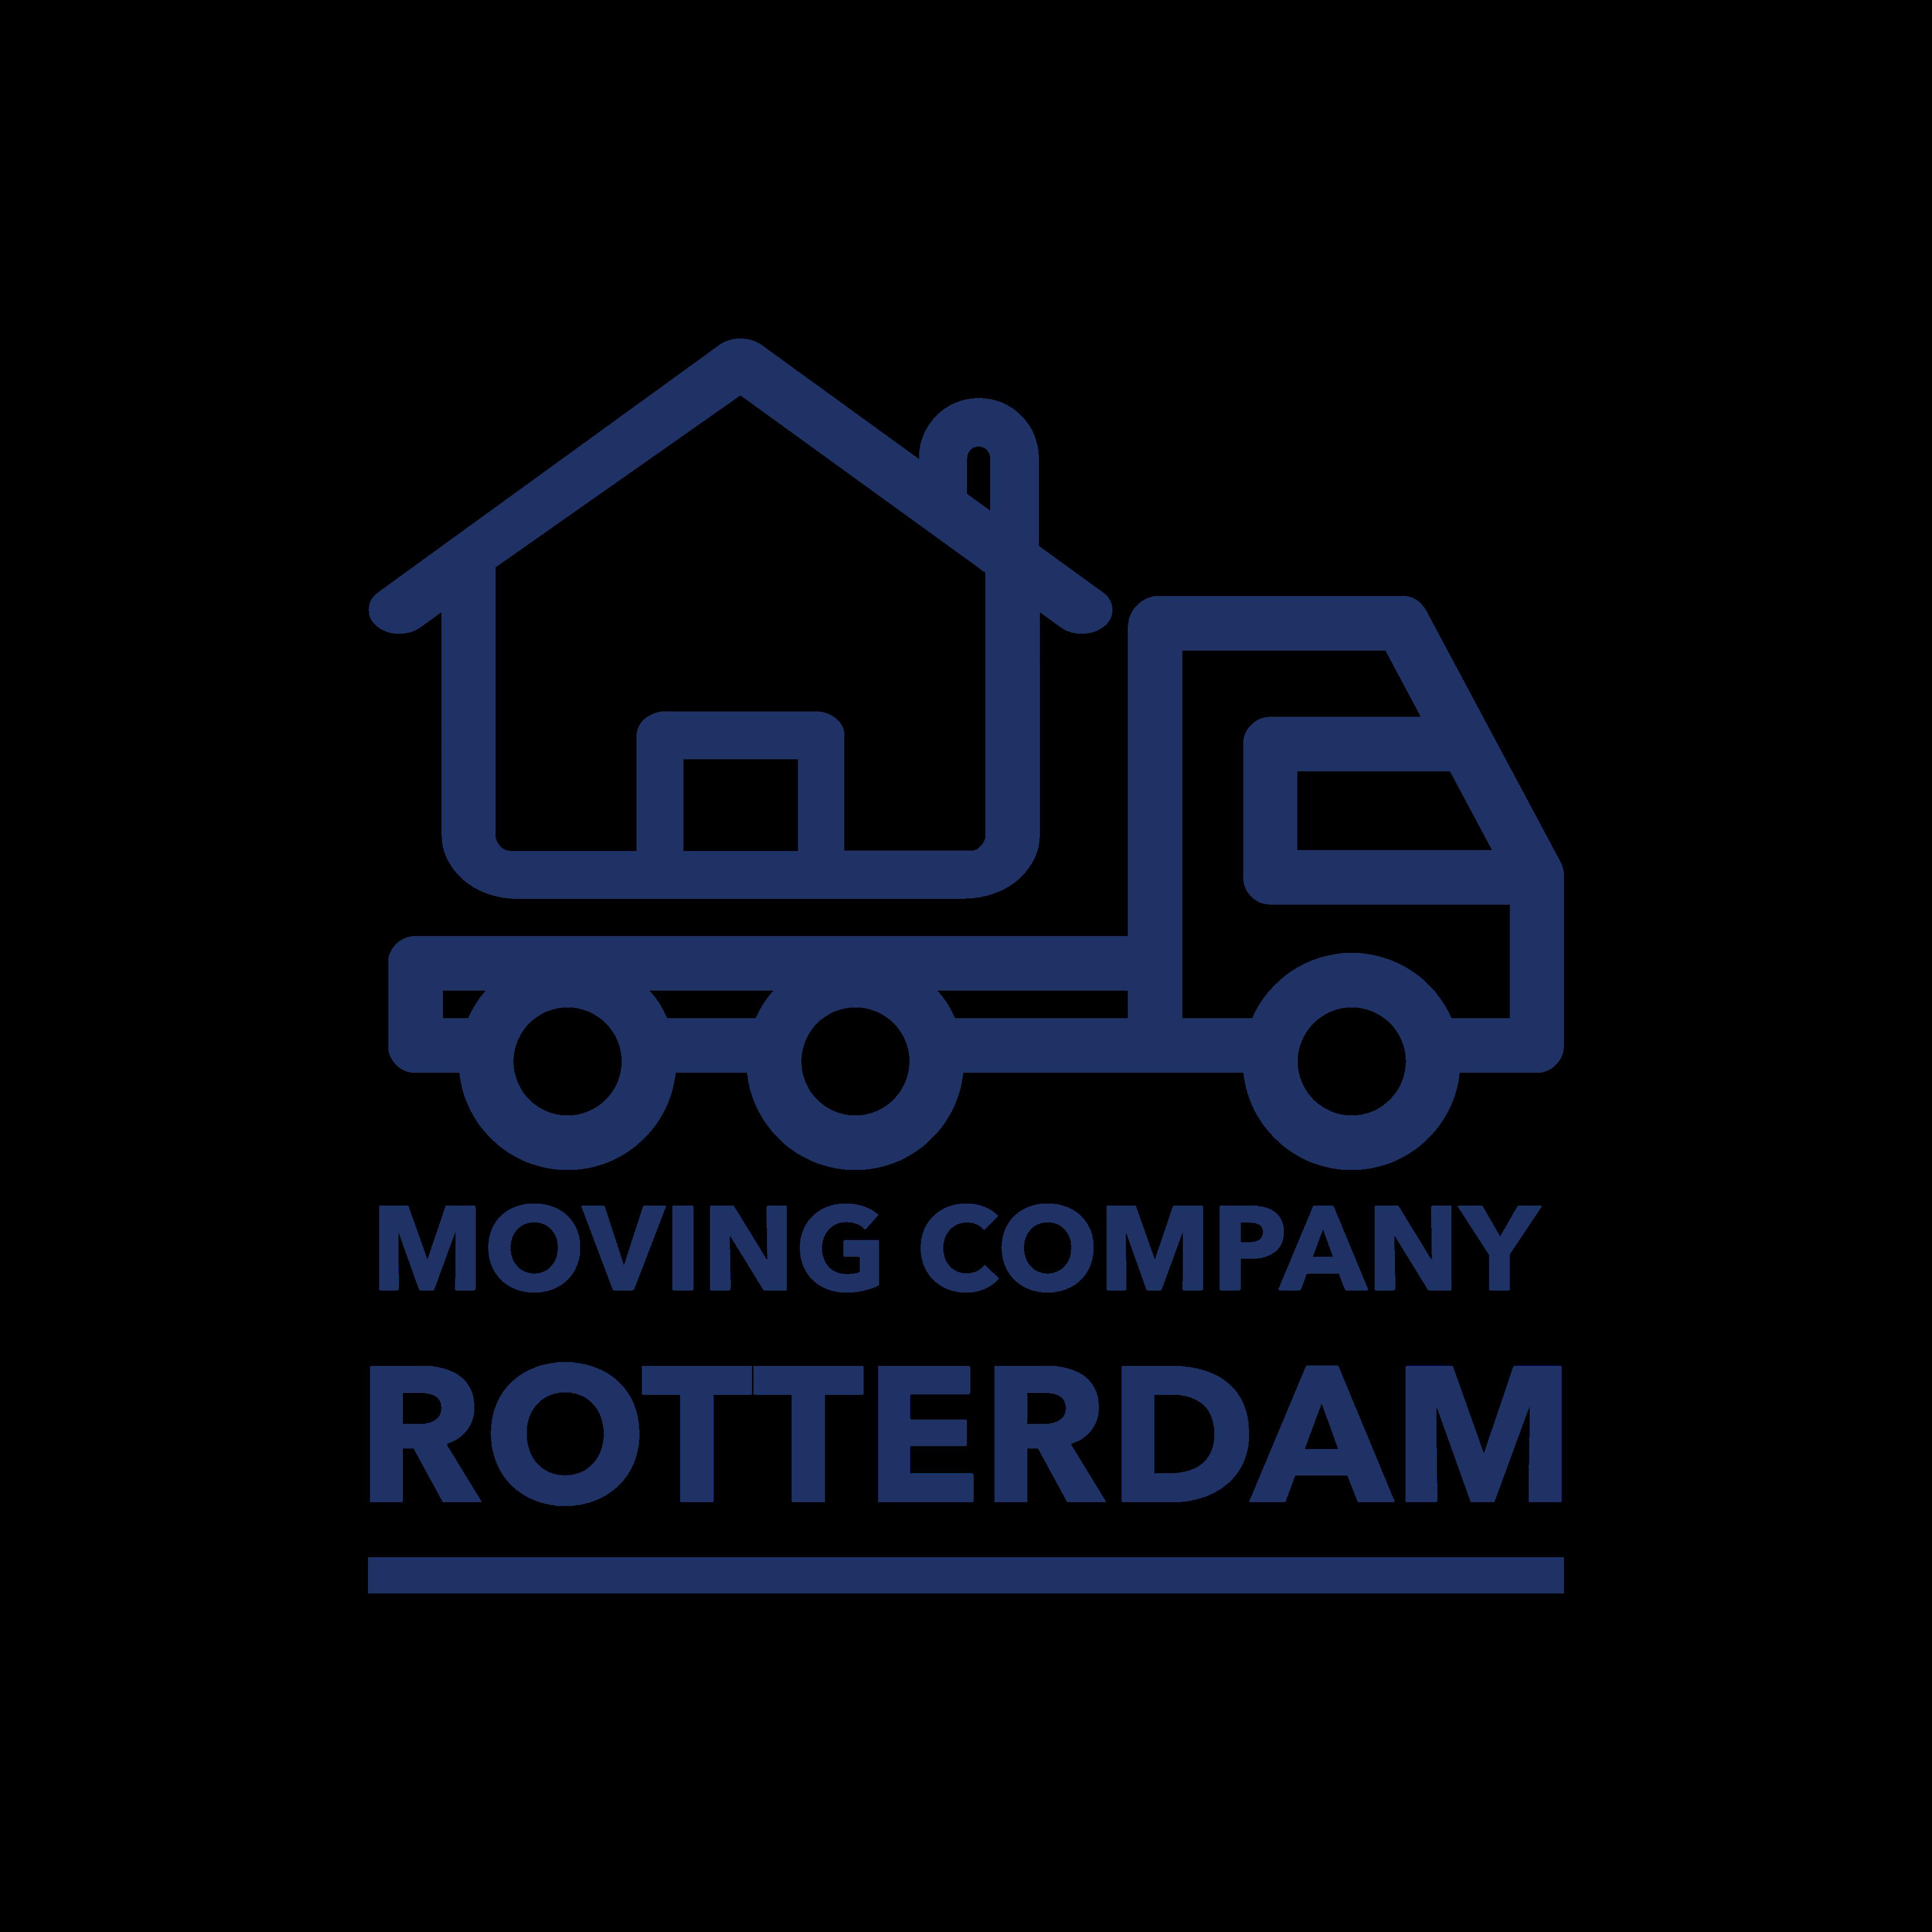 Moving Company Rotterdam